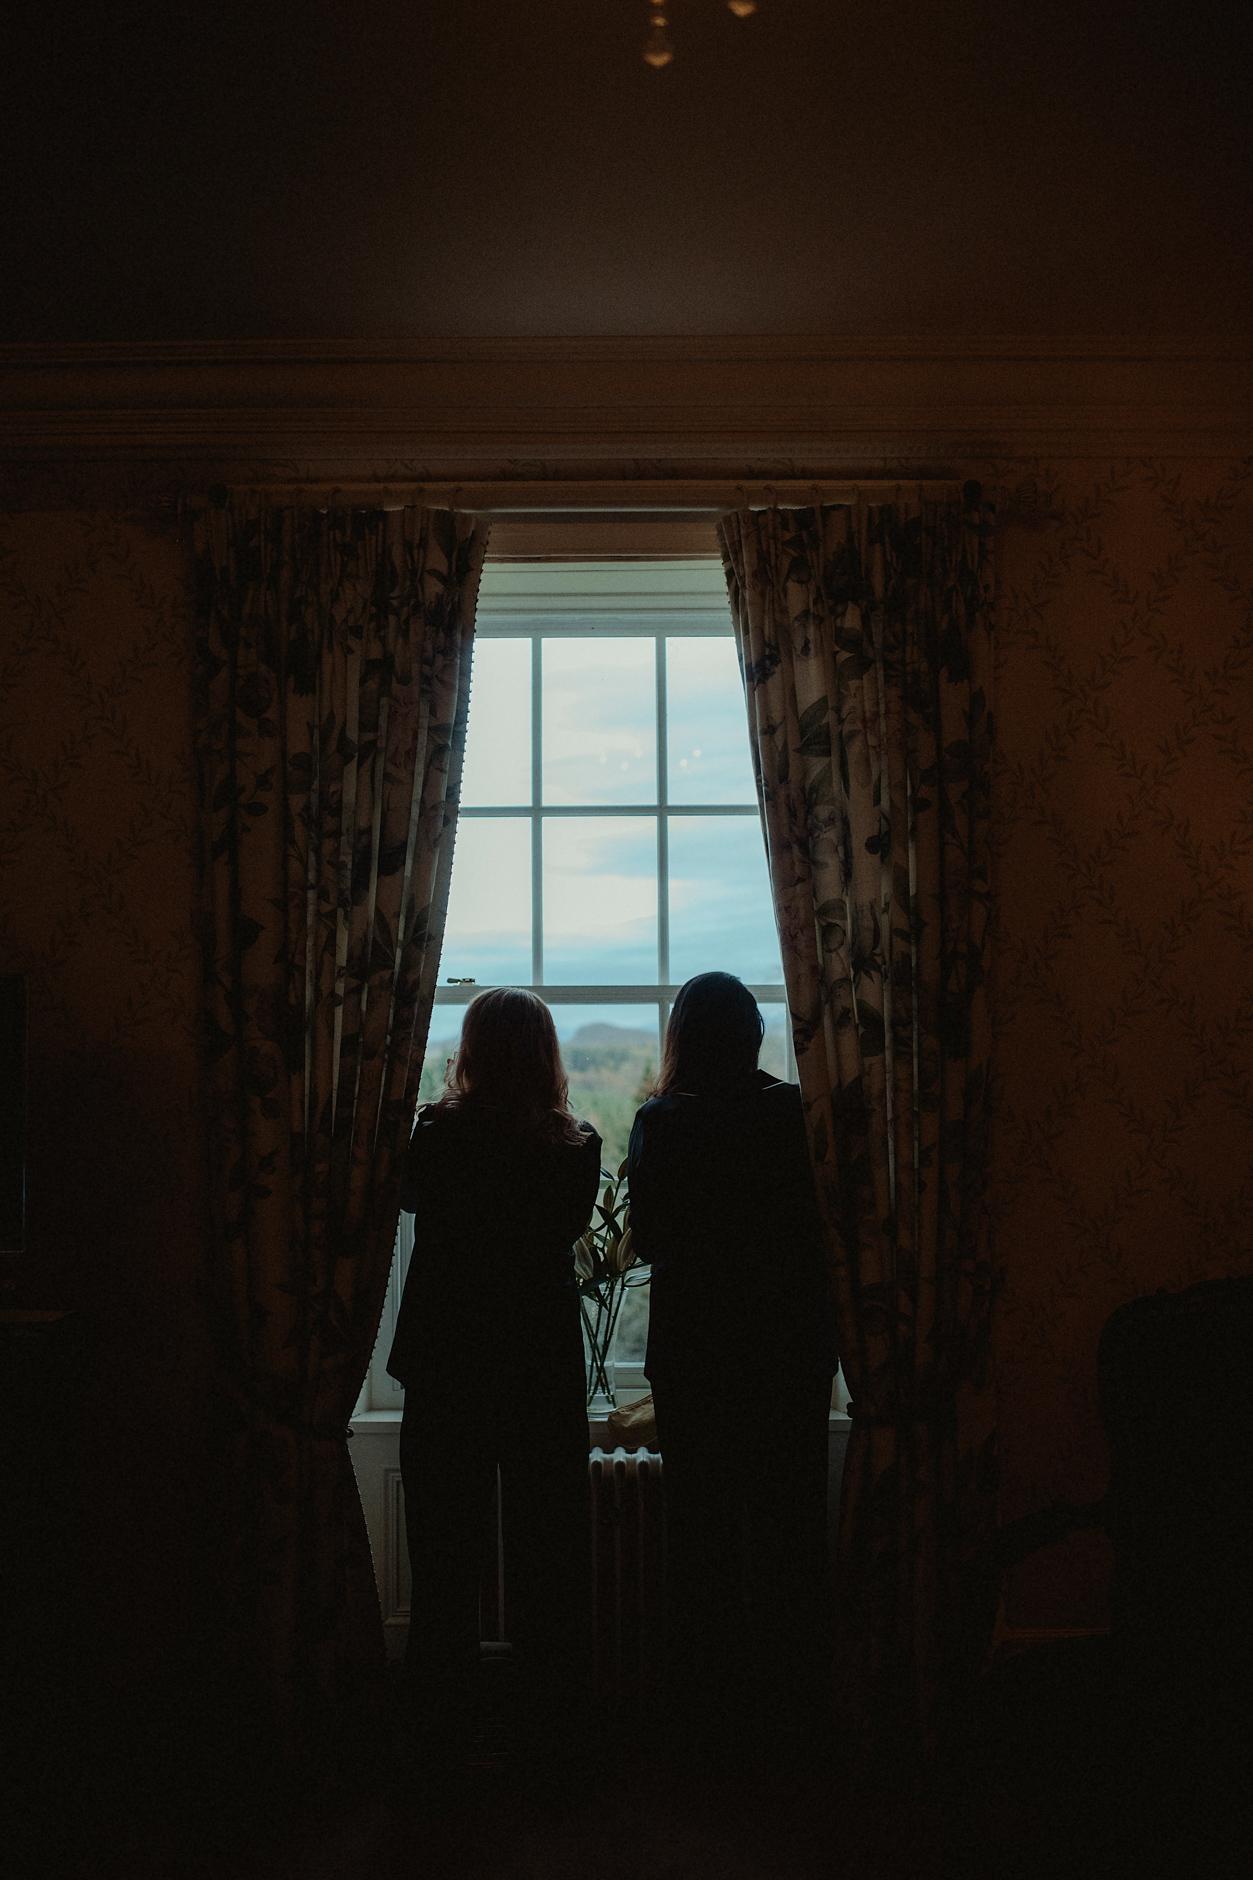 Glentruim-Wedding-Nikki-Leadbetter-Photography-7.jpg